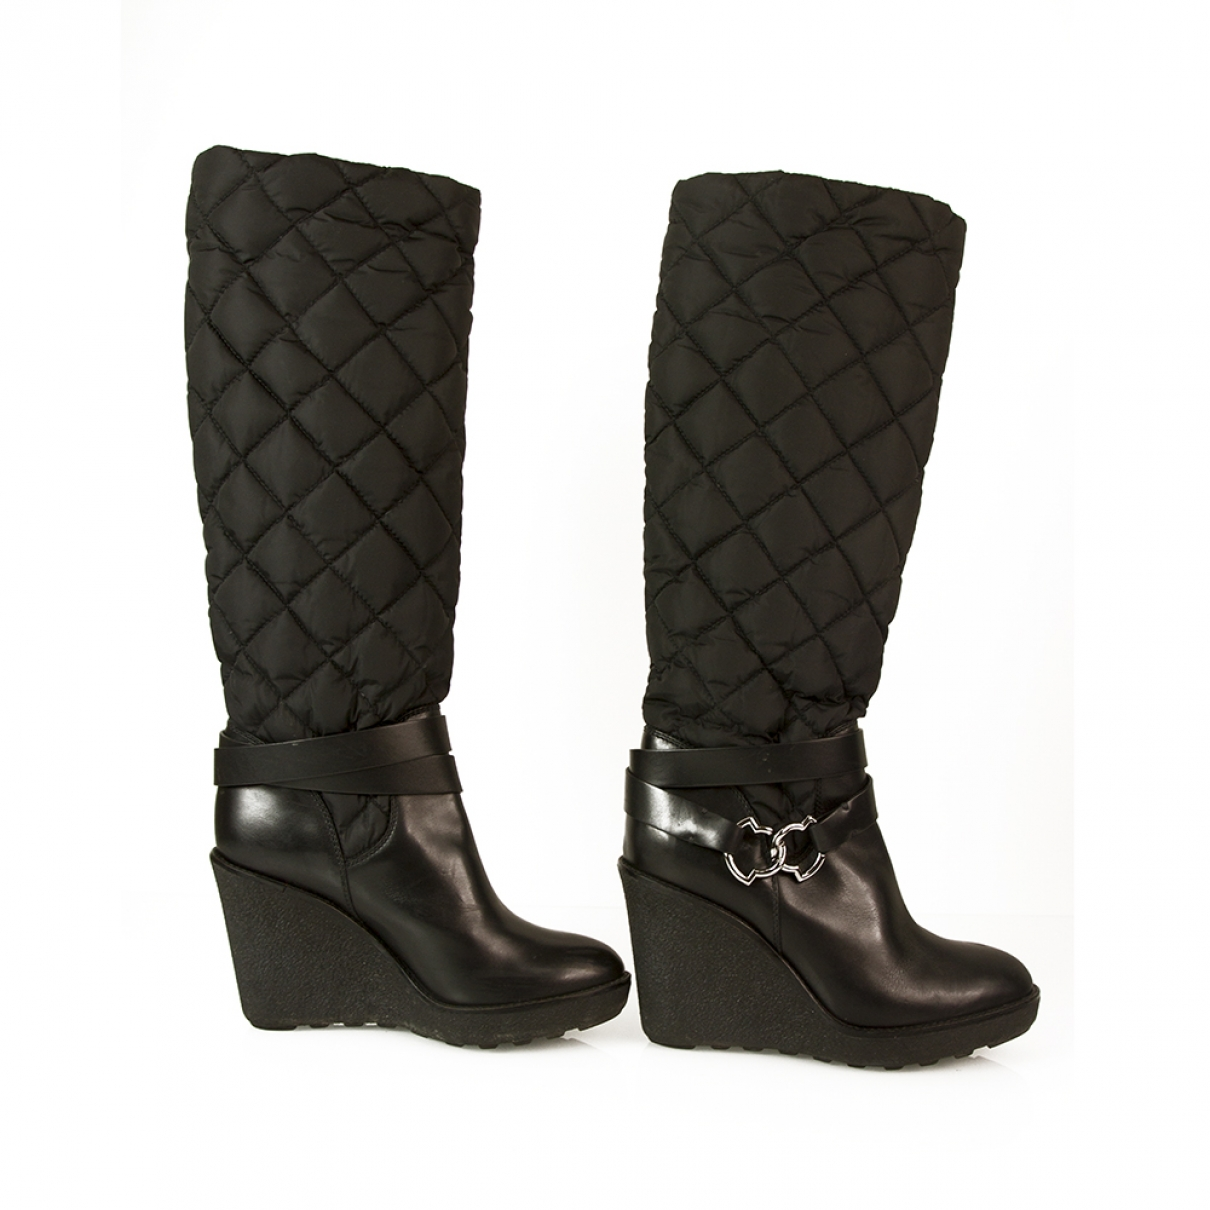 Moncler \N Black Boots for Women 37 EU